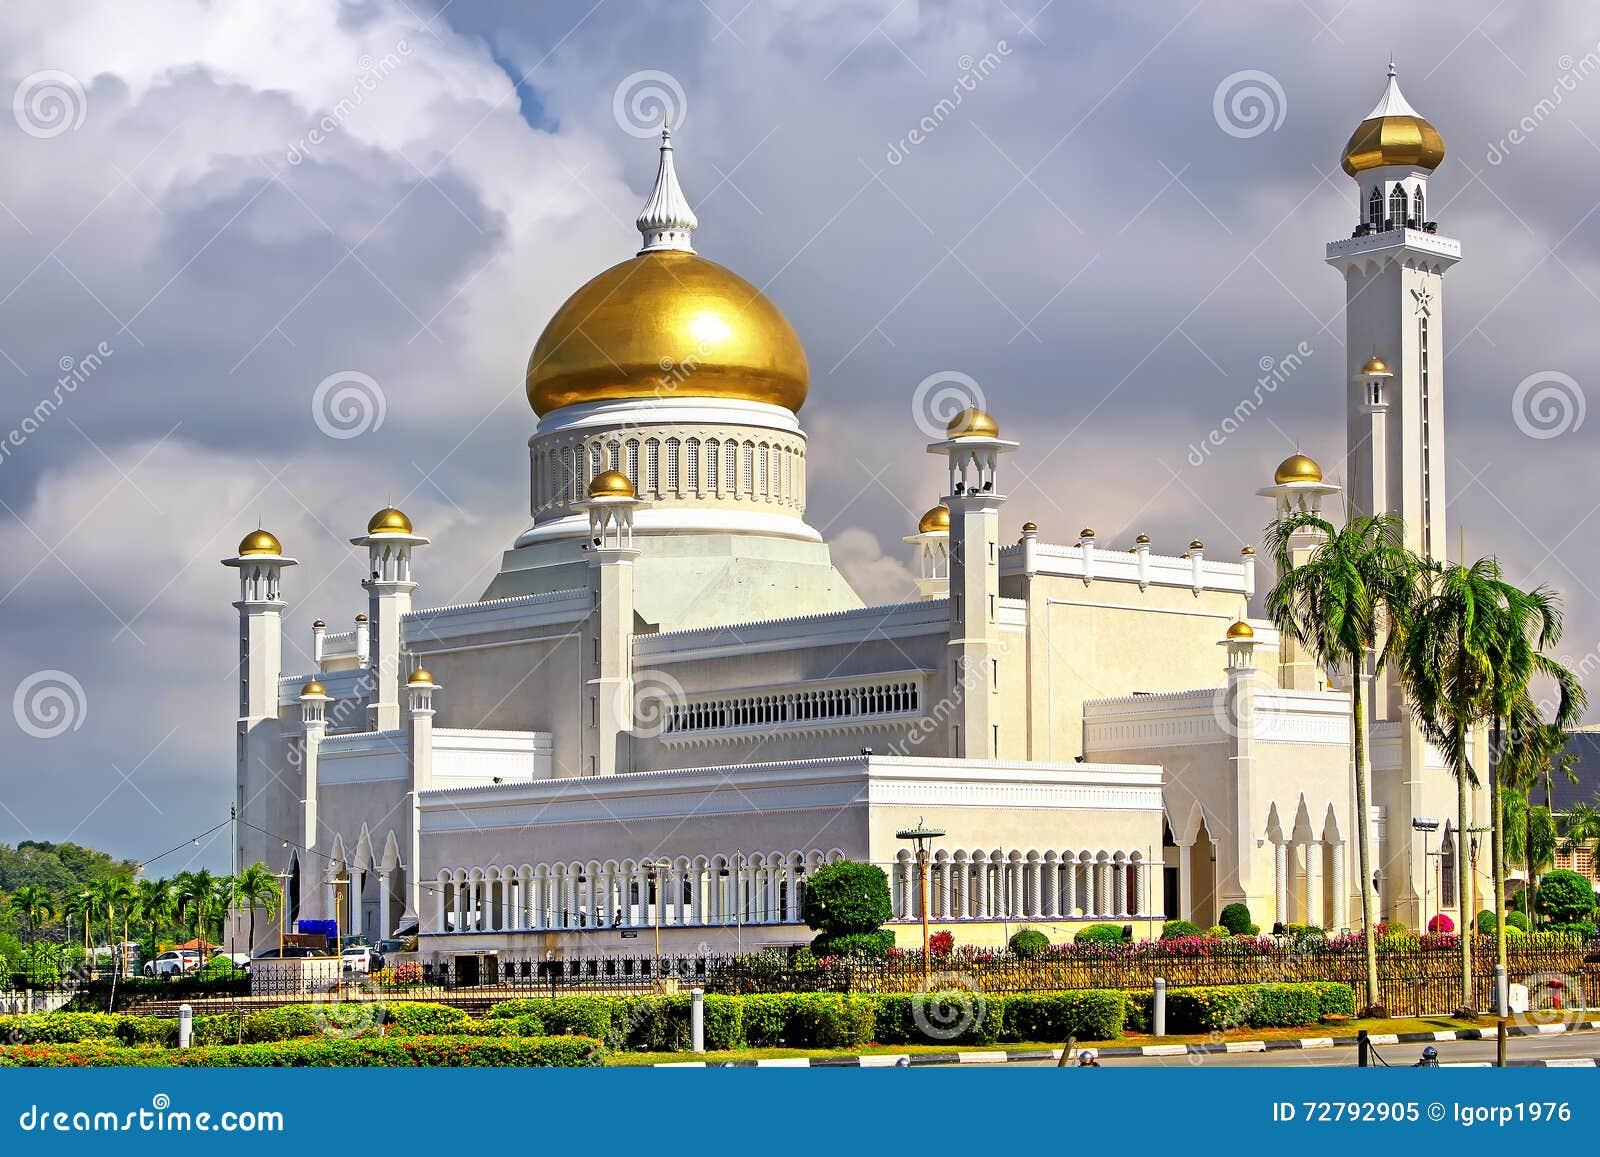 Sultan Omar Ali Saifudding Mosque Bandar Seri Begawan, Brunei,